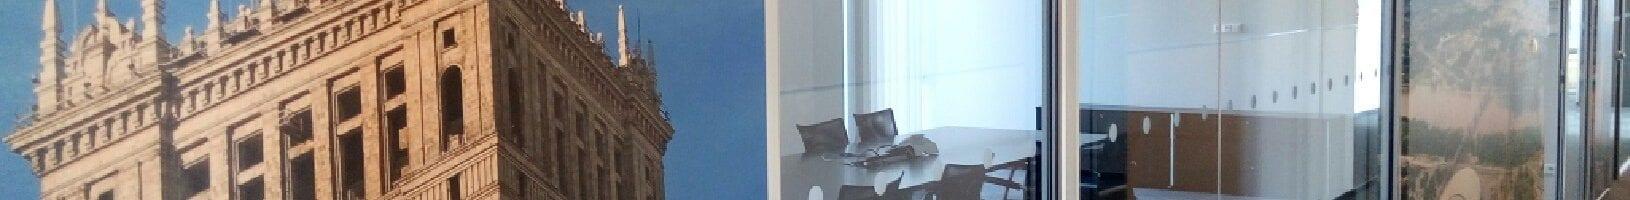 P70527 073810 1630x200 - Rozbudowa biura w  Platinium Business Park